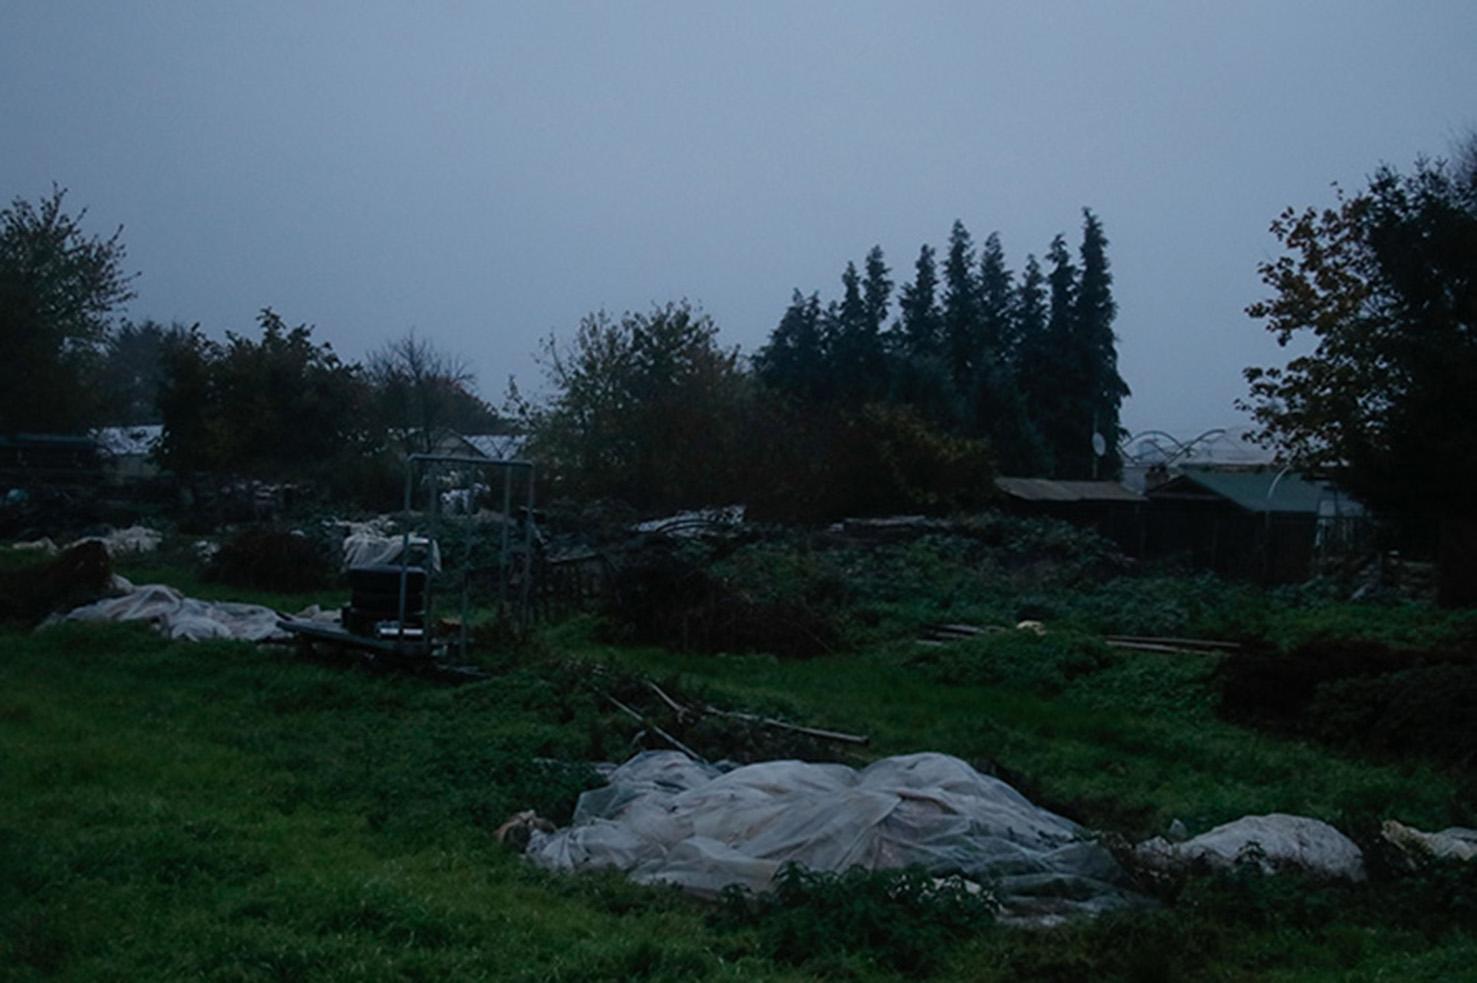 Feld am Spätabend, aus Urban Lanscapes, Nathalie Heinke